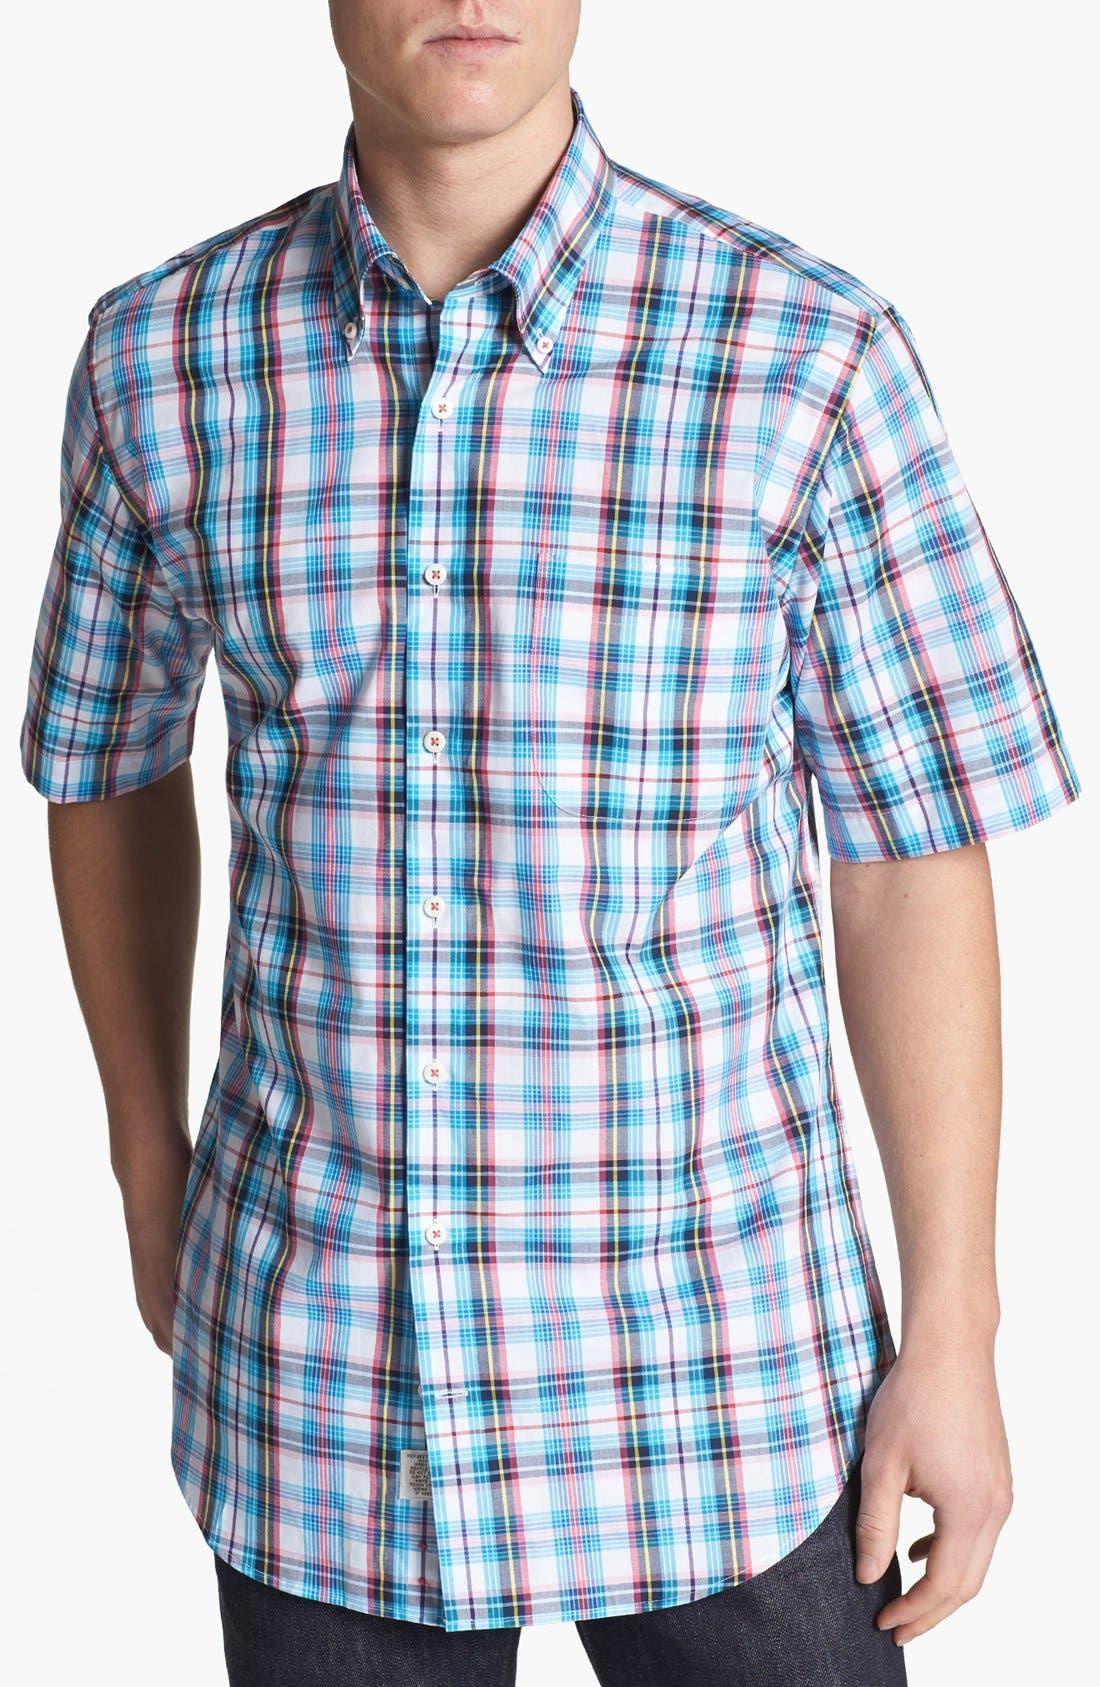 Main Image - Peter Millar 'Nantucket' Tartan Short Sleeve Sport Shirt